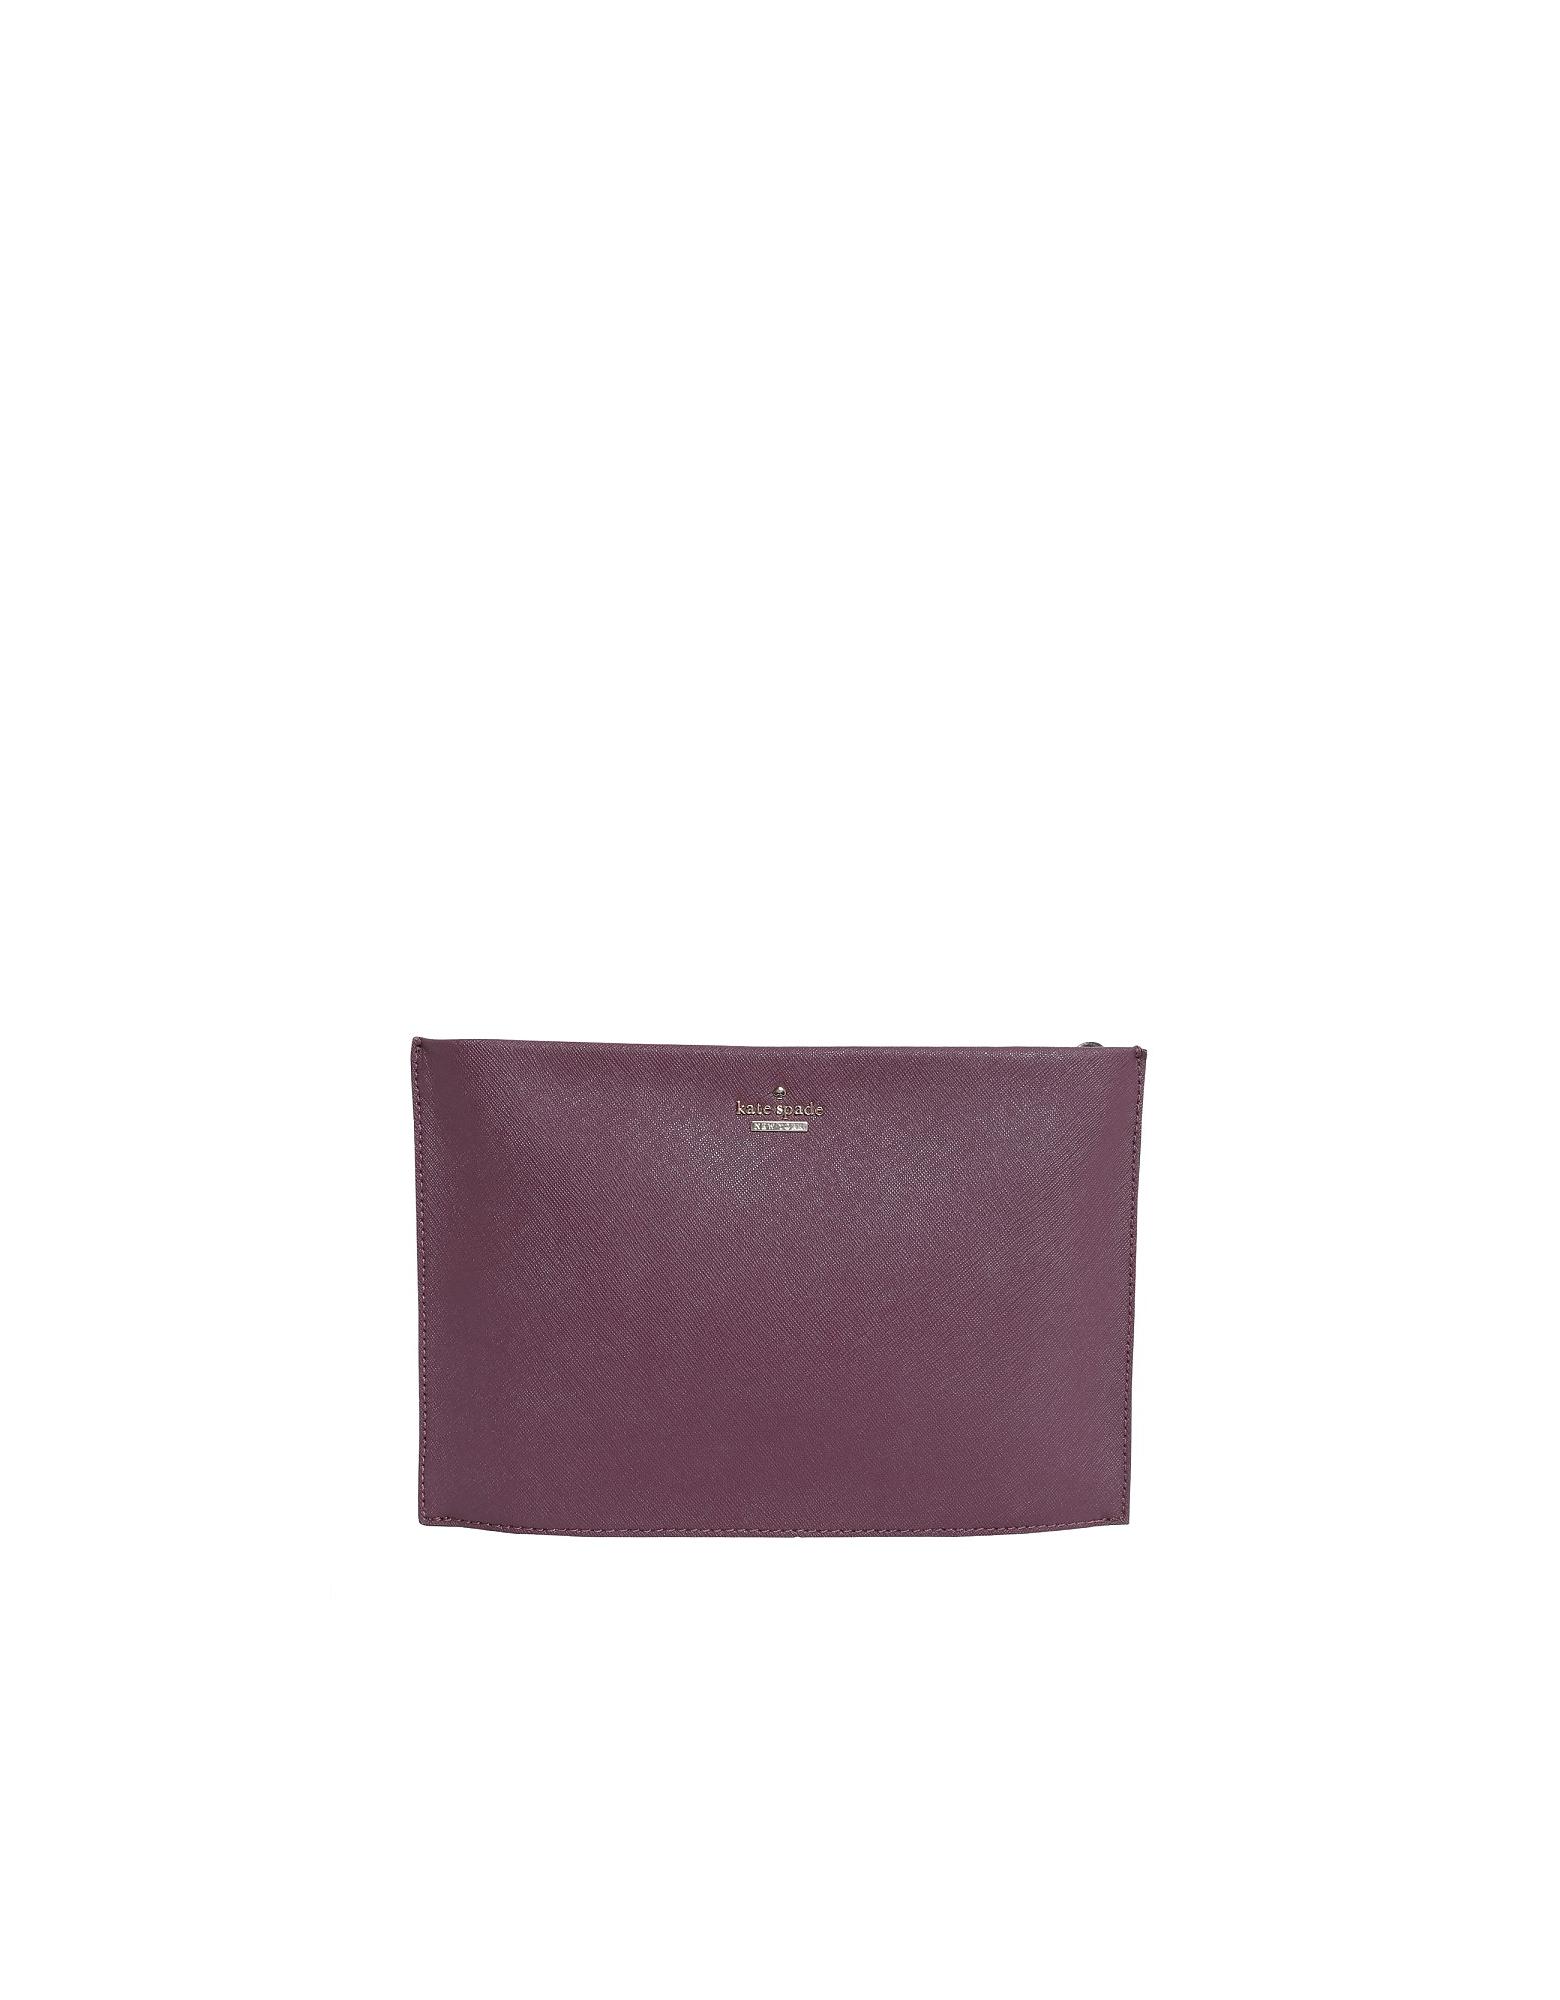 Kate Spade New York Designer Handbags, Cameron Street Sima Clutch